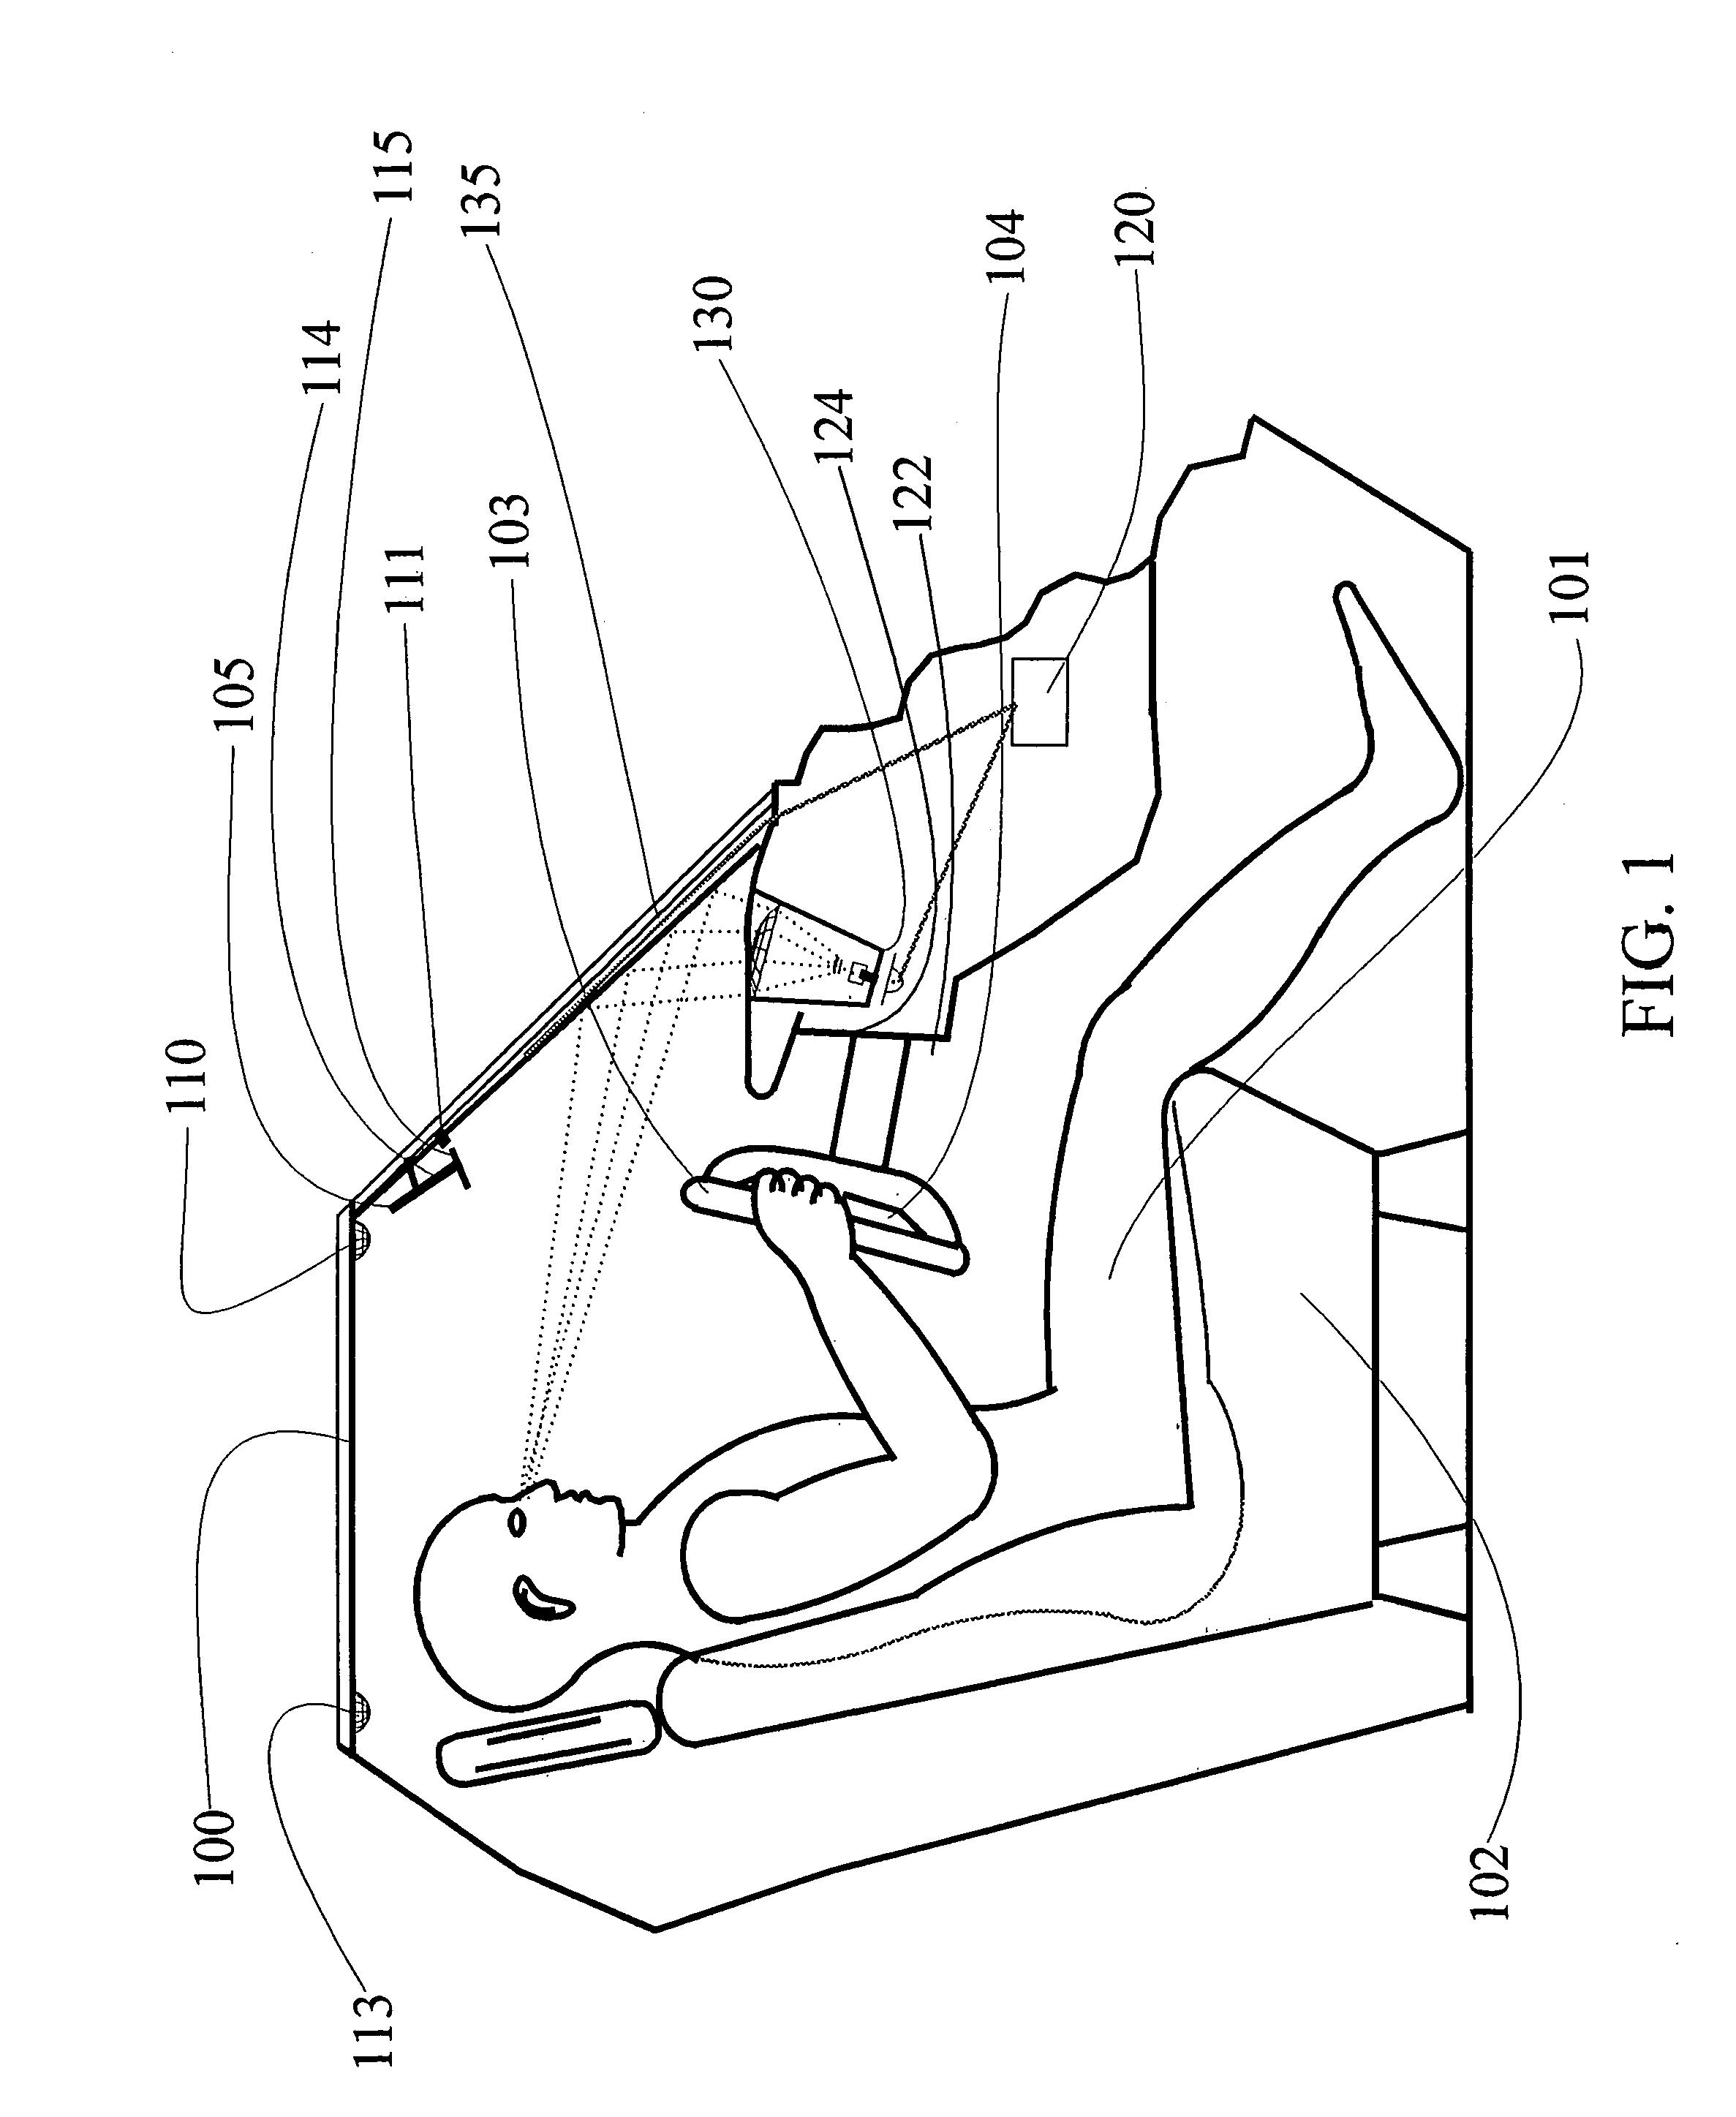 patent us 7 126 583 b1 Solar Panel Offices patent images patent images